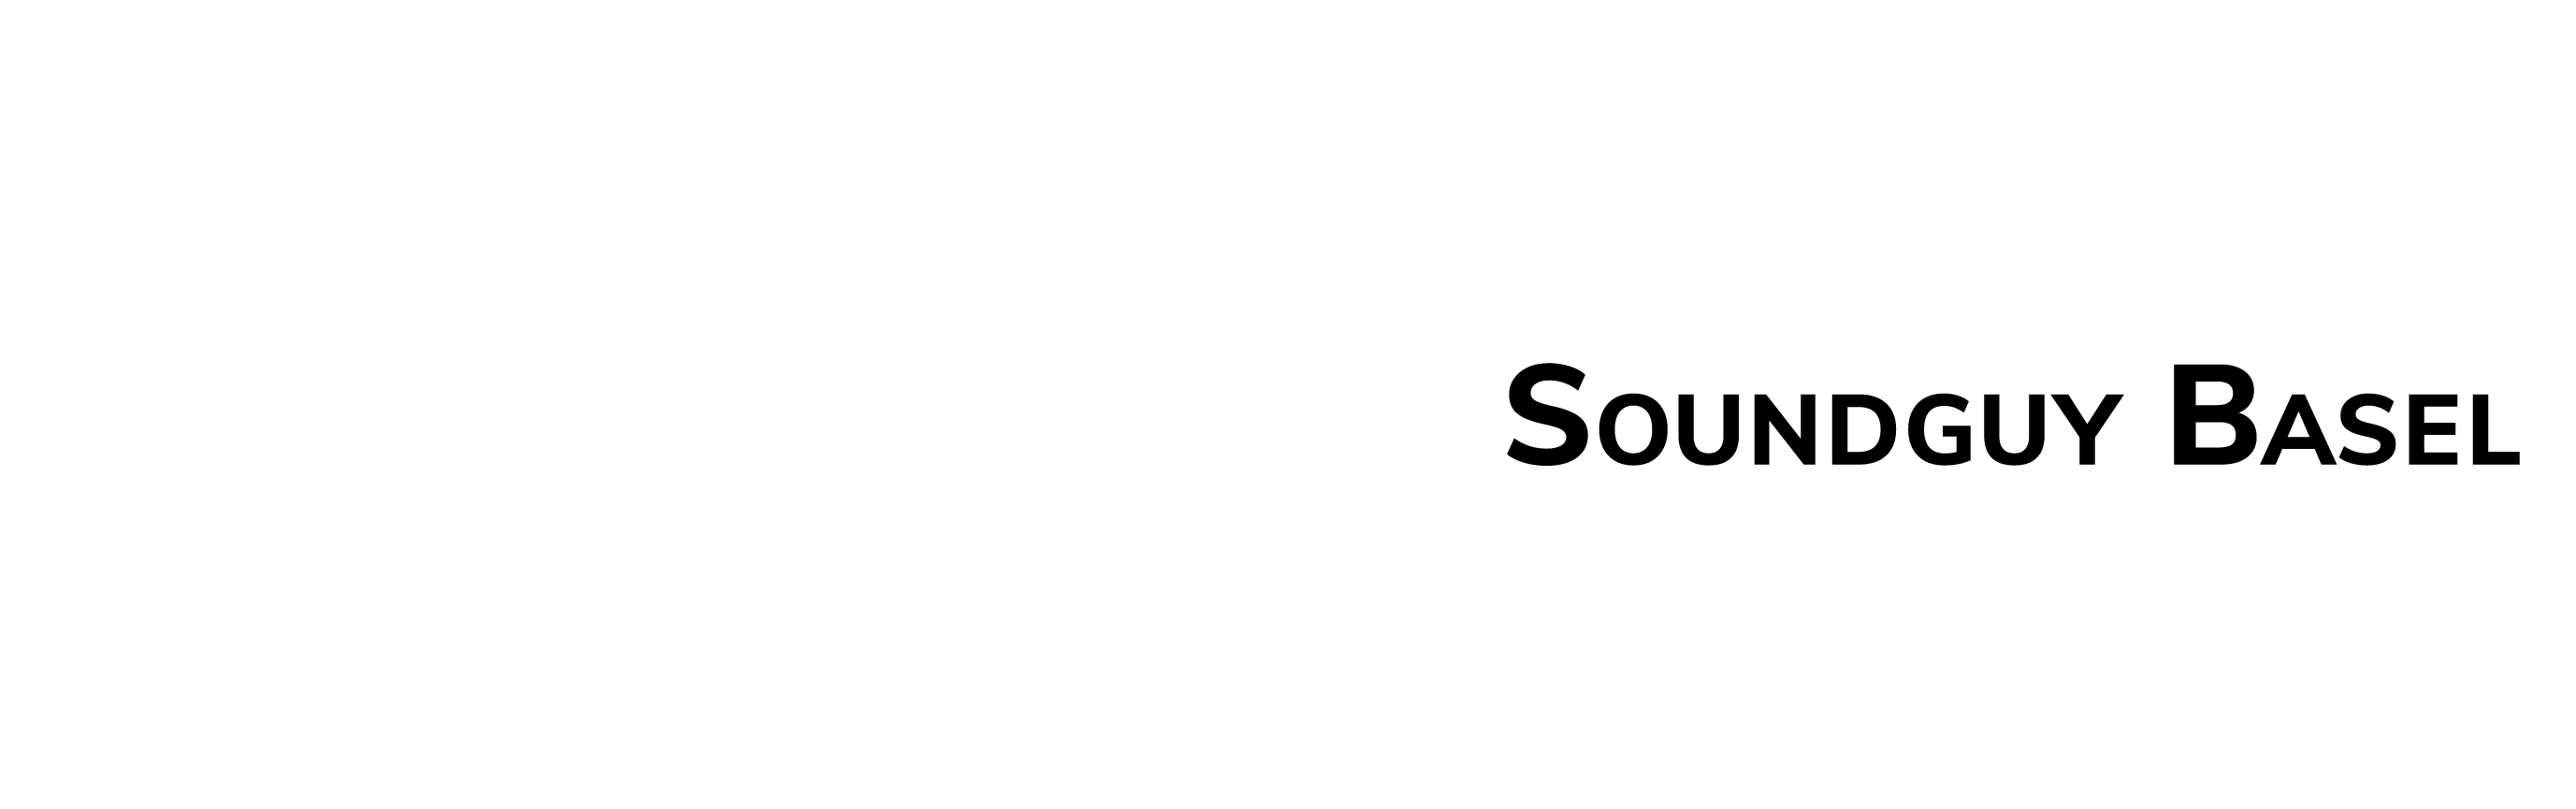 soundguybasel